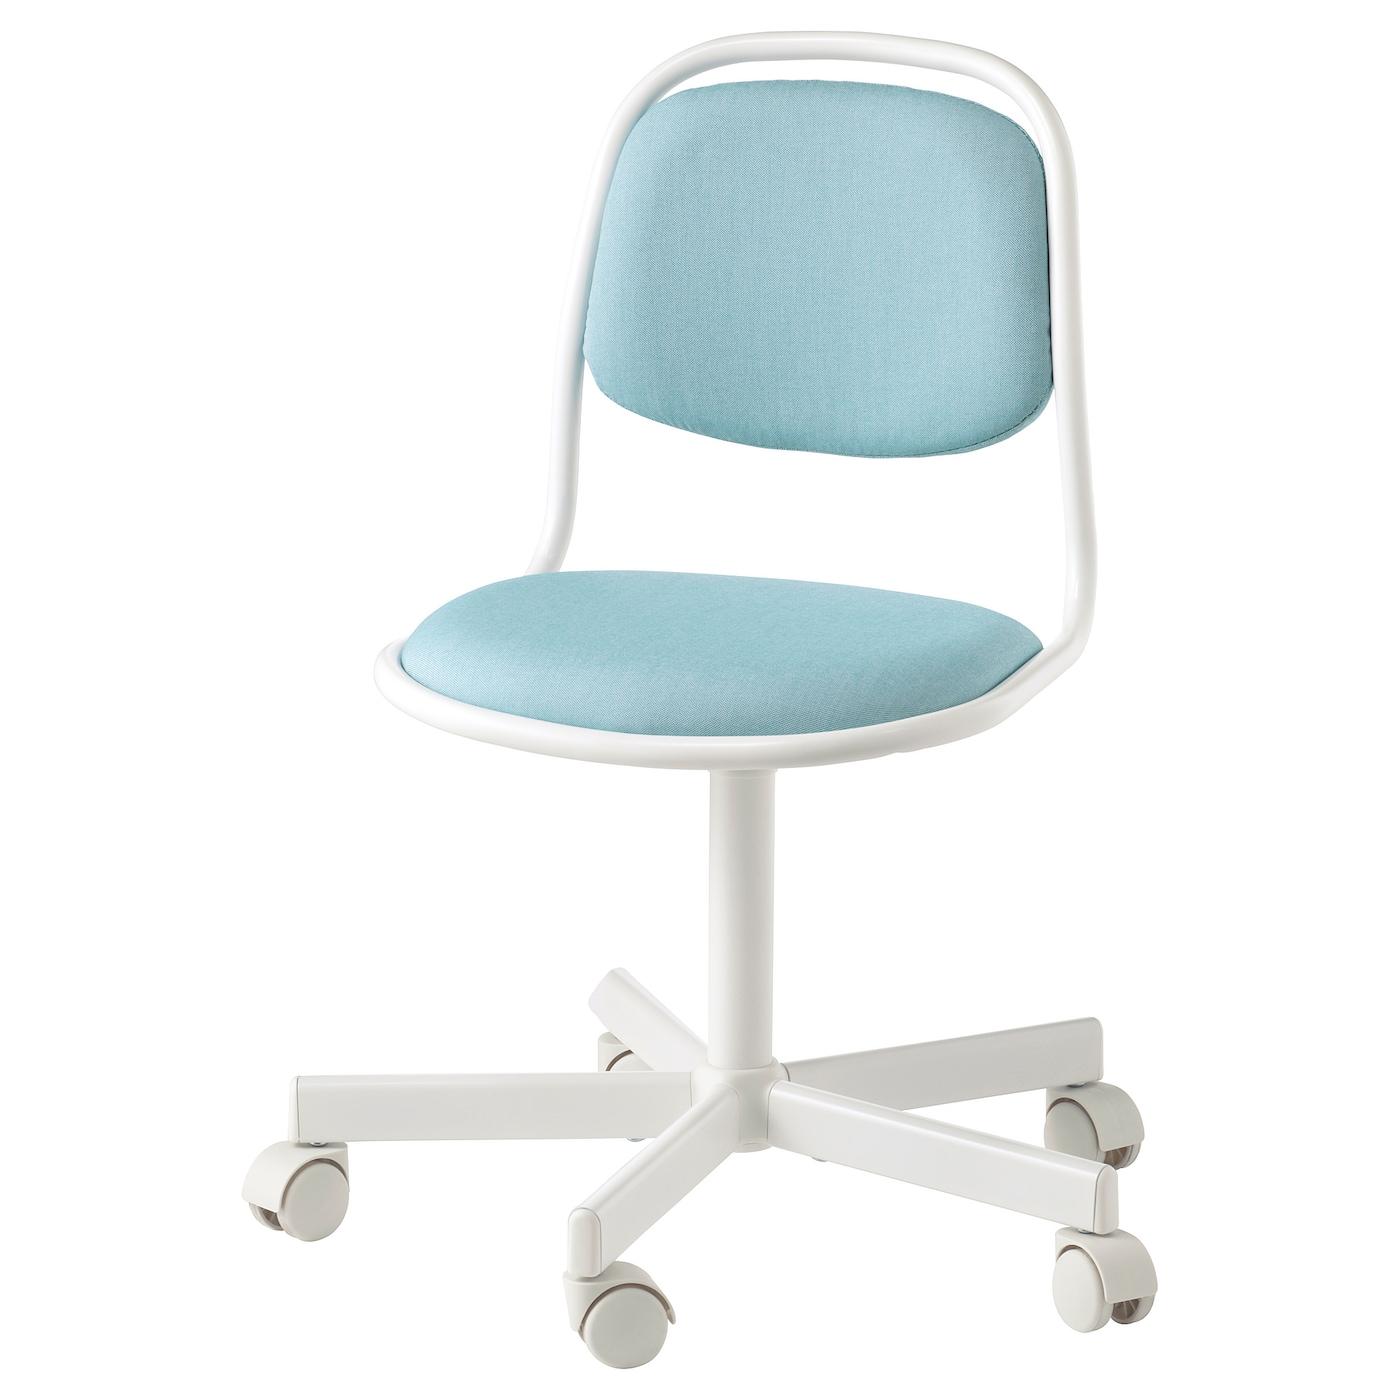 Orfjall Child S Desk Chair White Vissle Blue Green